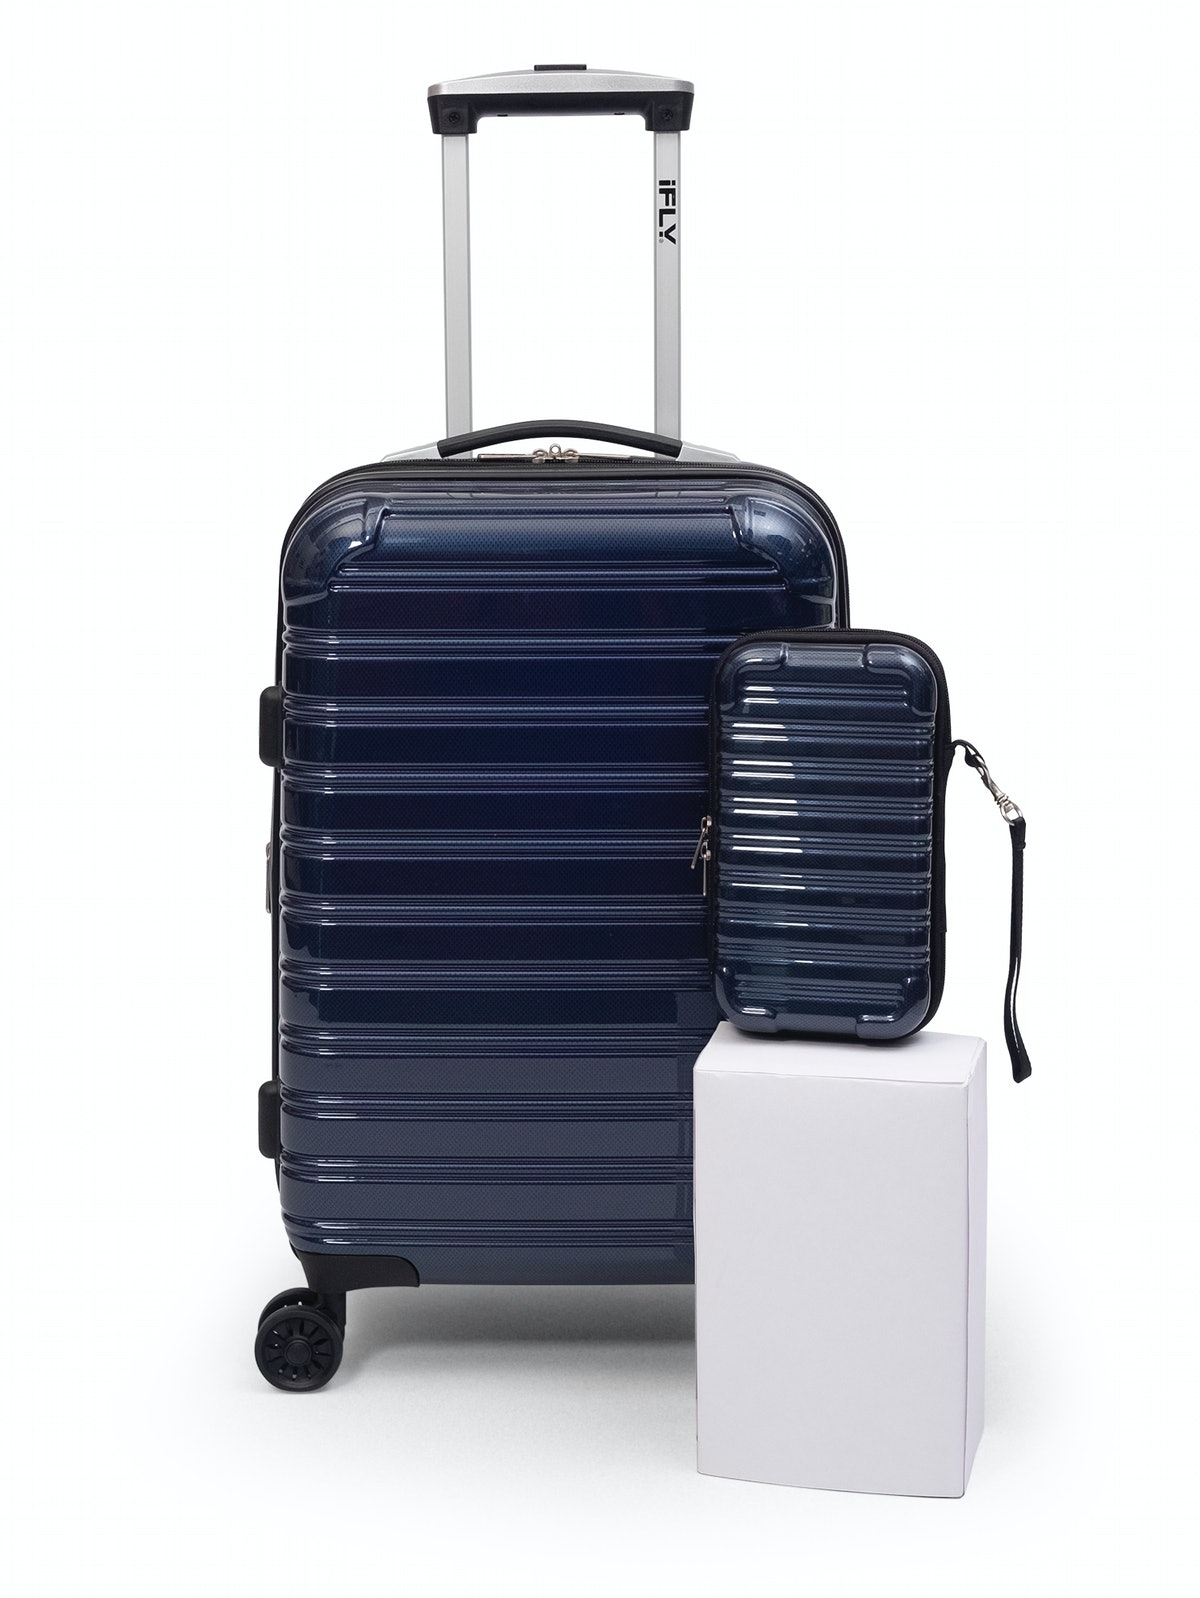 "iFLY Hard Sided Luggage Fibertech 20"" & Travel Case"